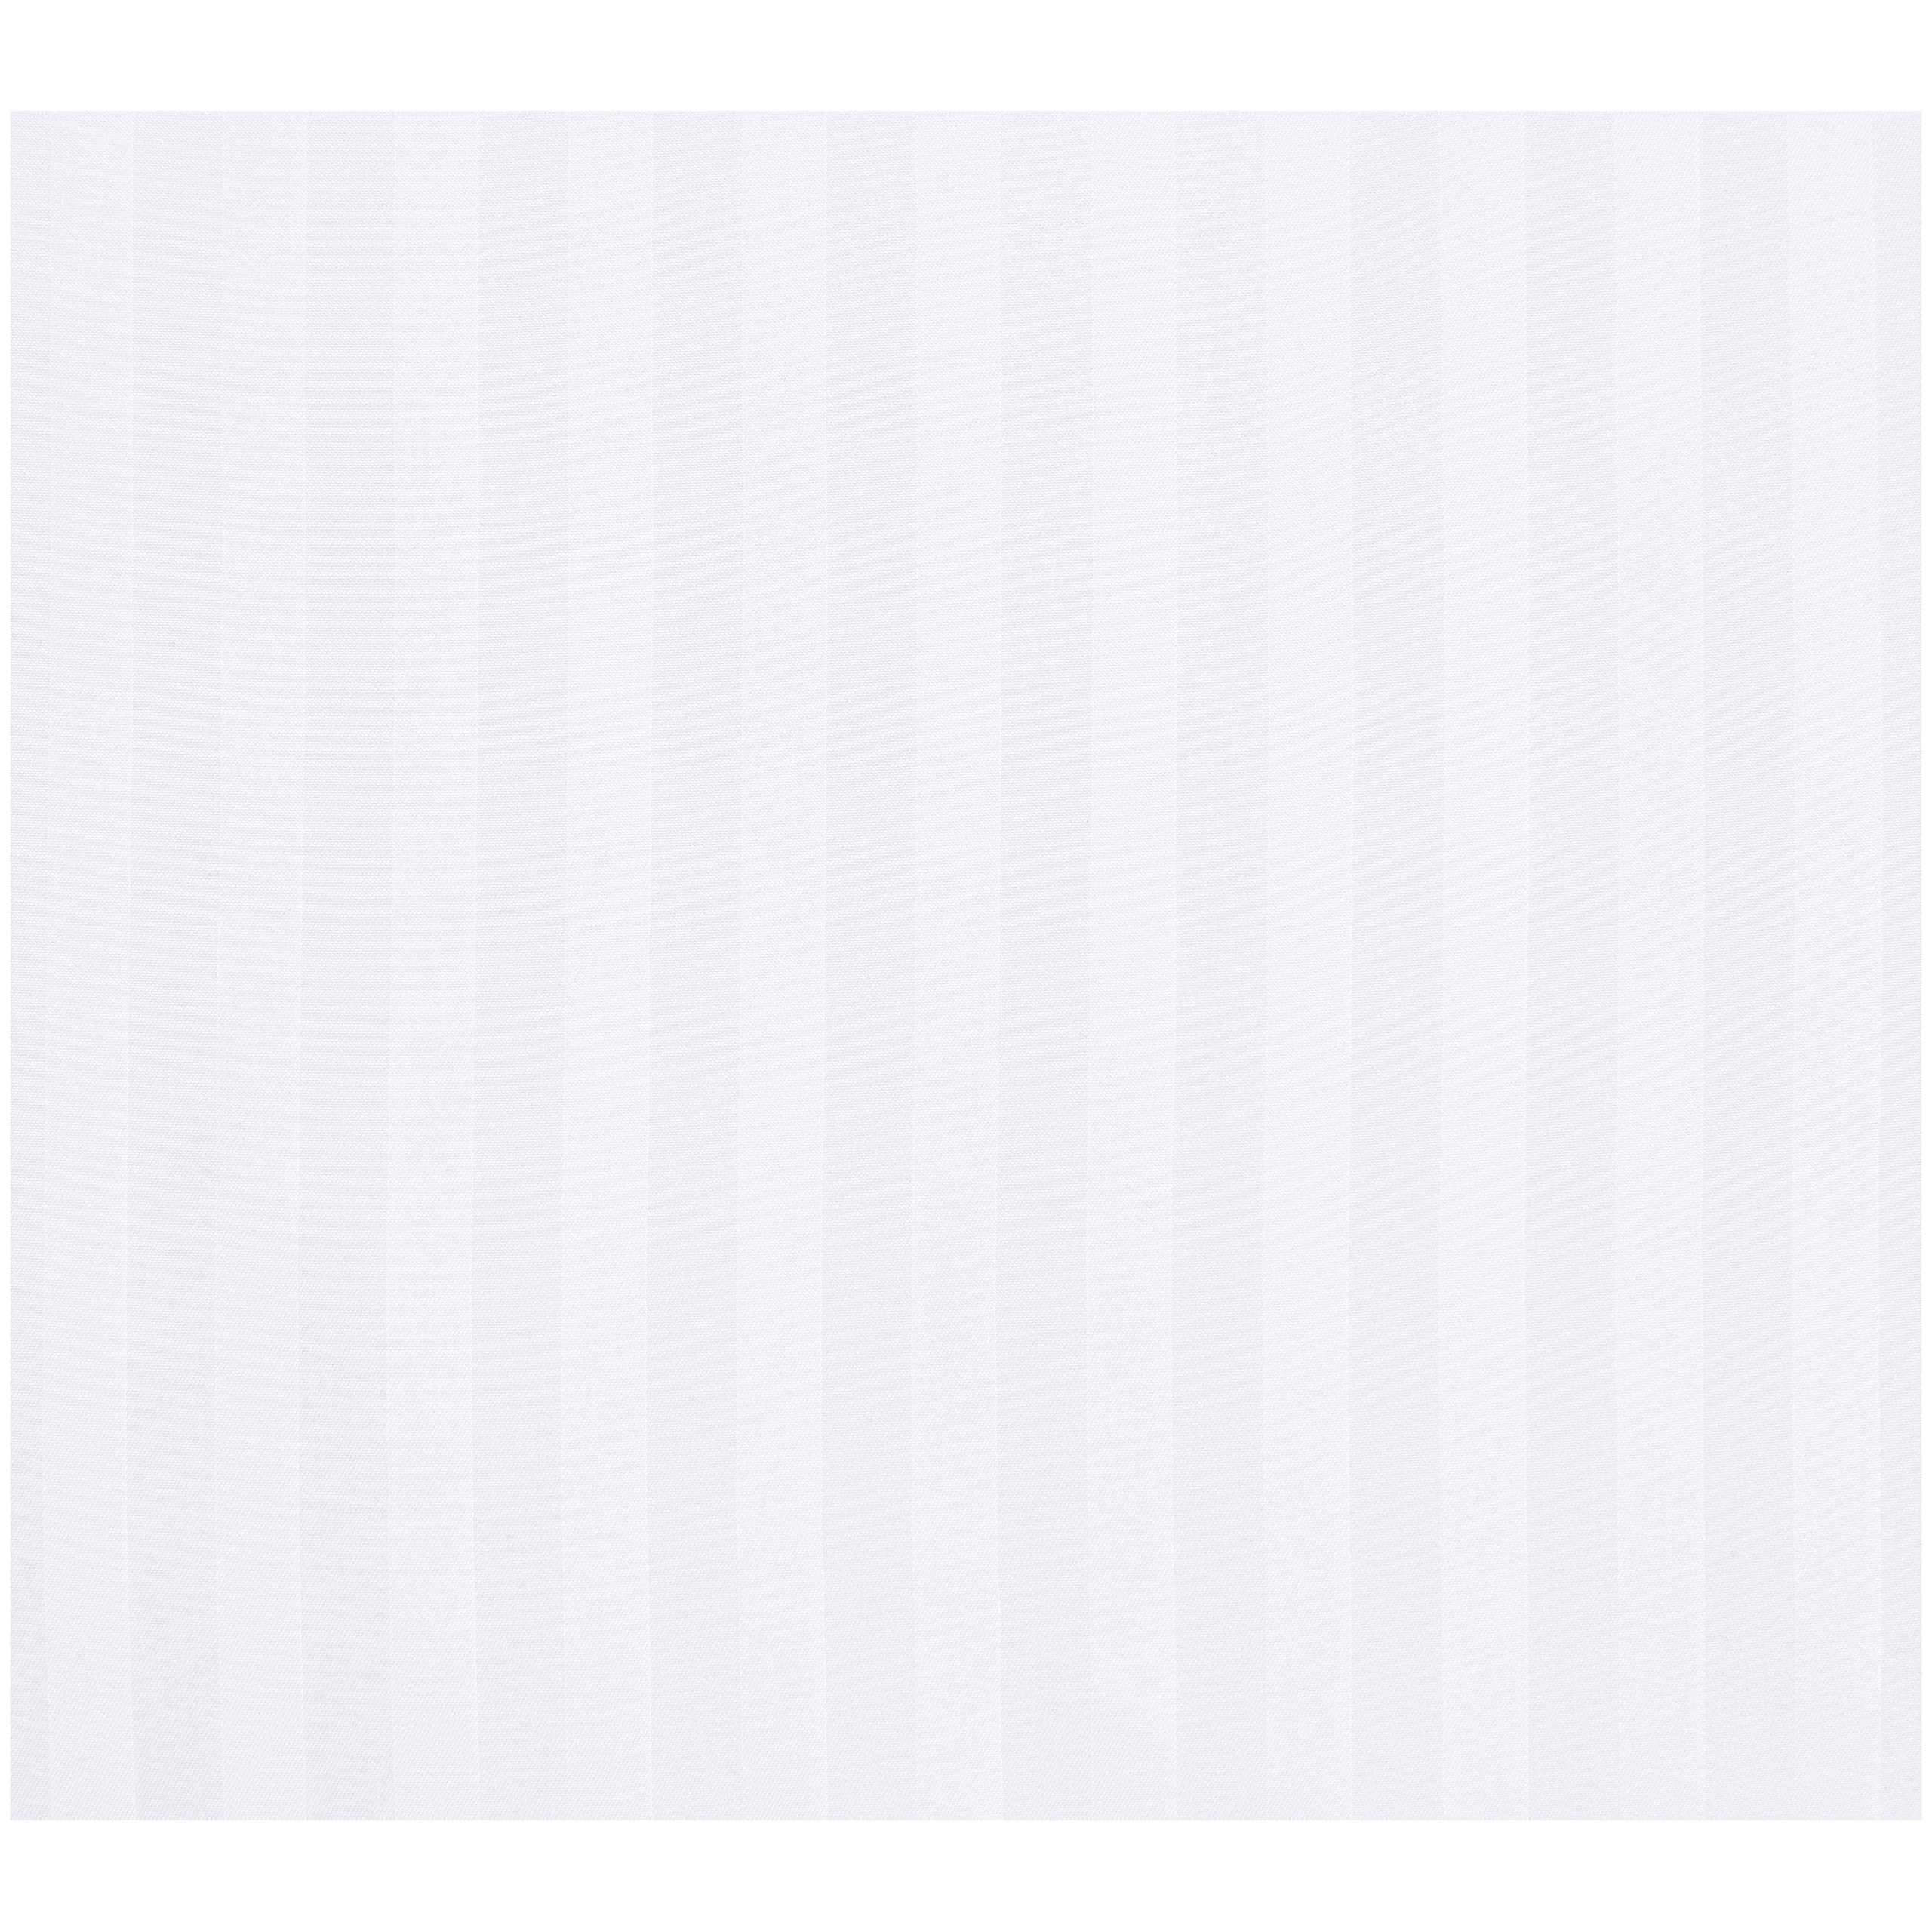 AmazonBasics Deluxe Striped Microfiber Duvet Cover Set - Full or Queen, Bright White by AmazonBasics (Image #2)